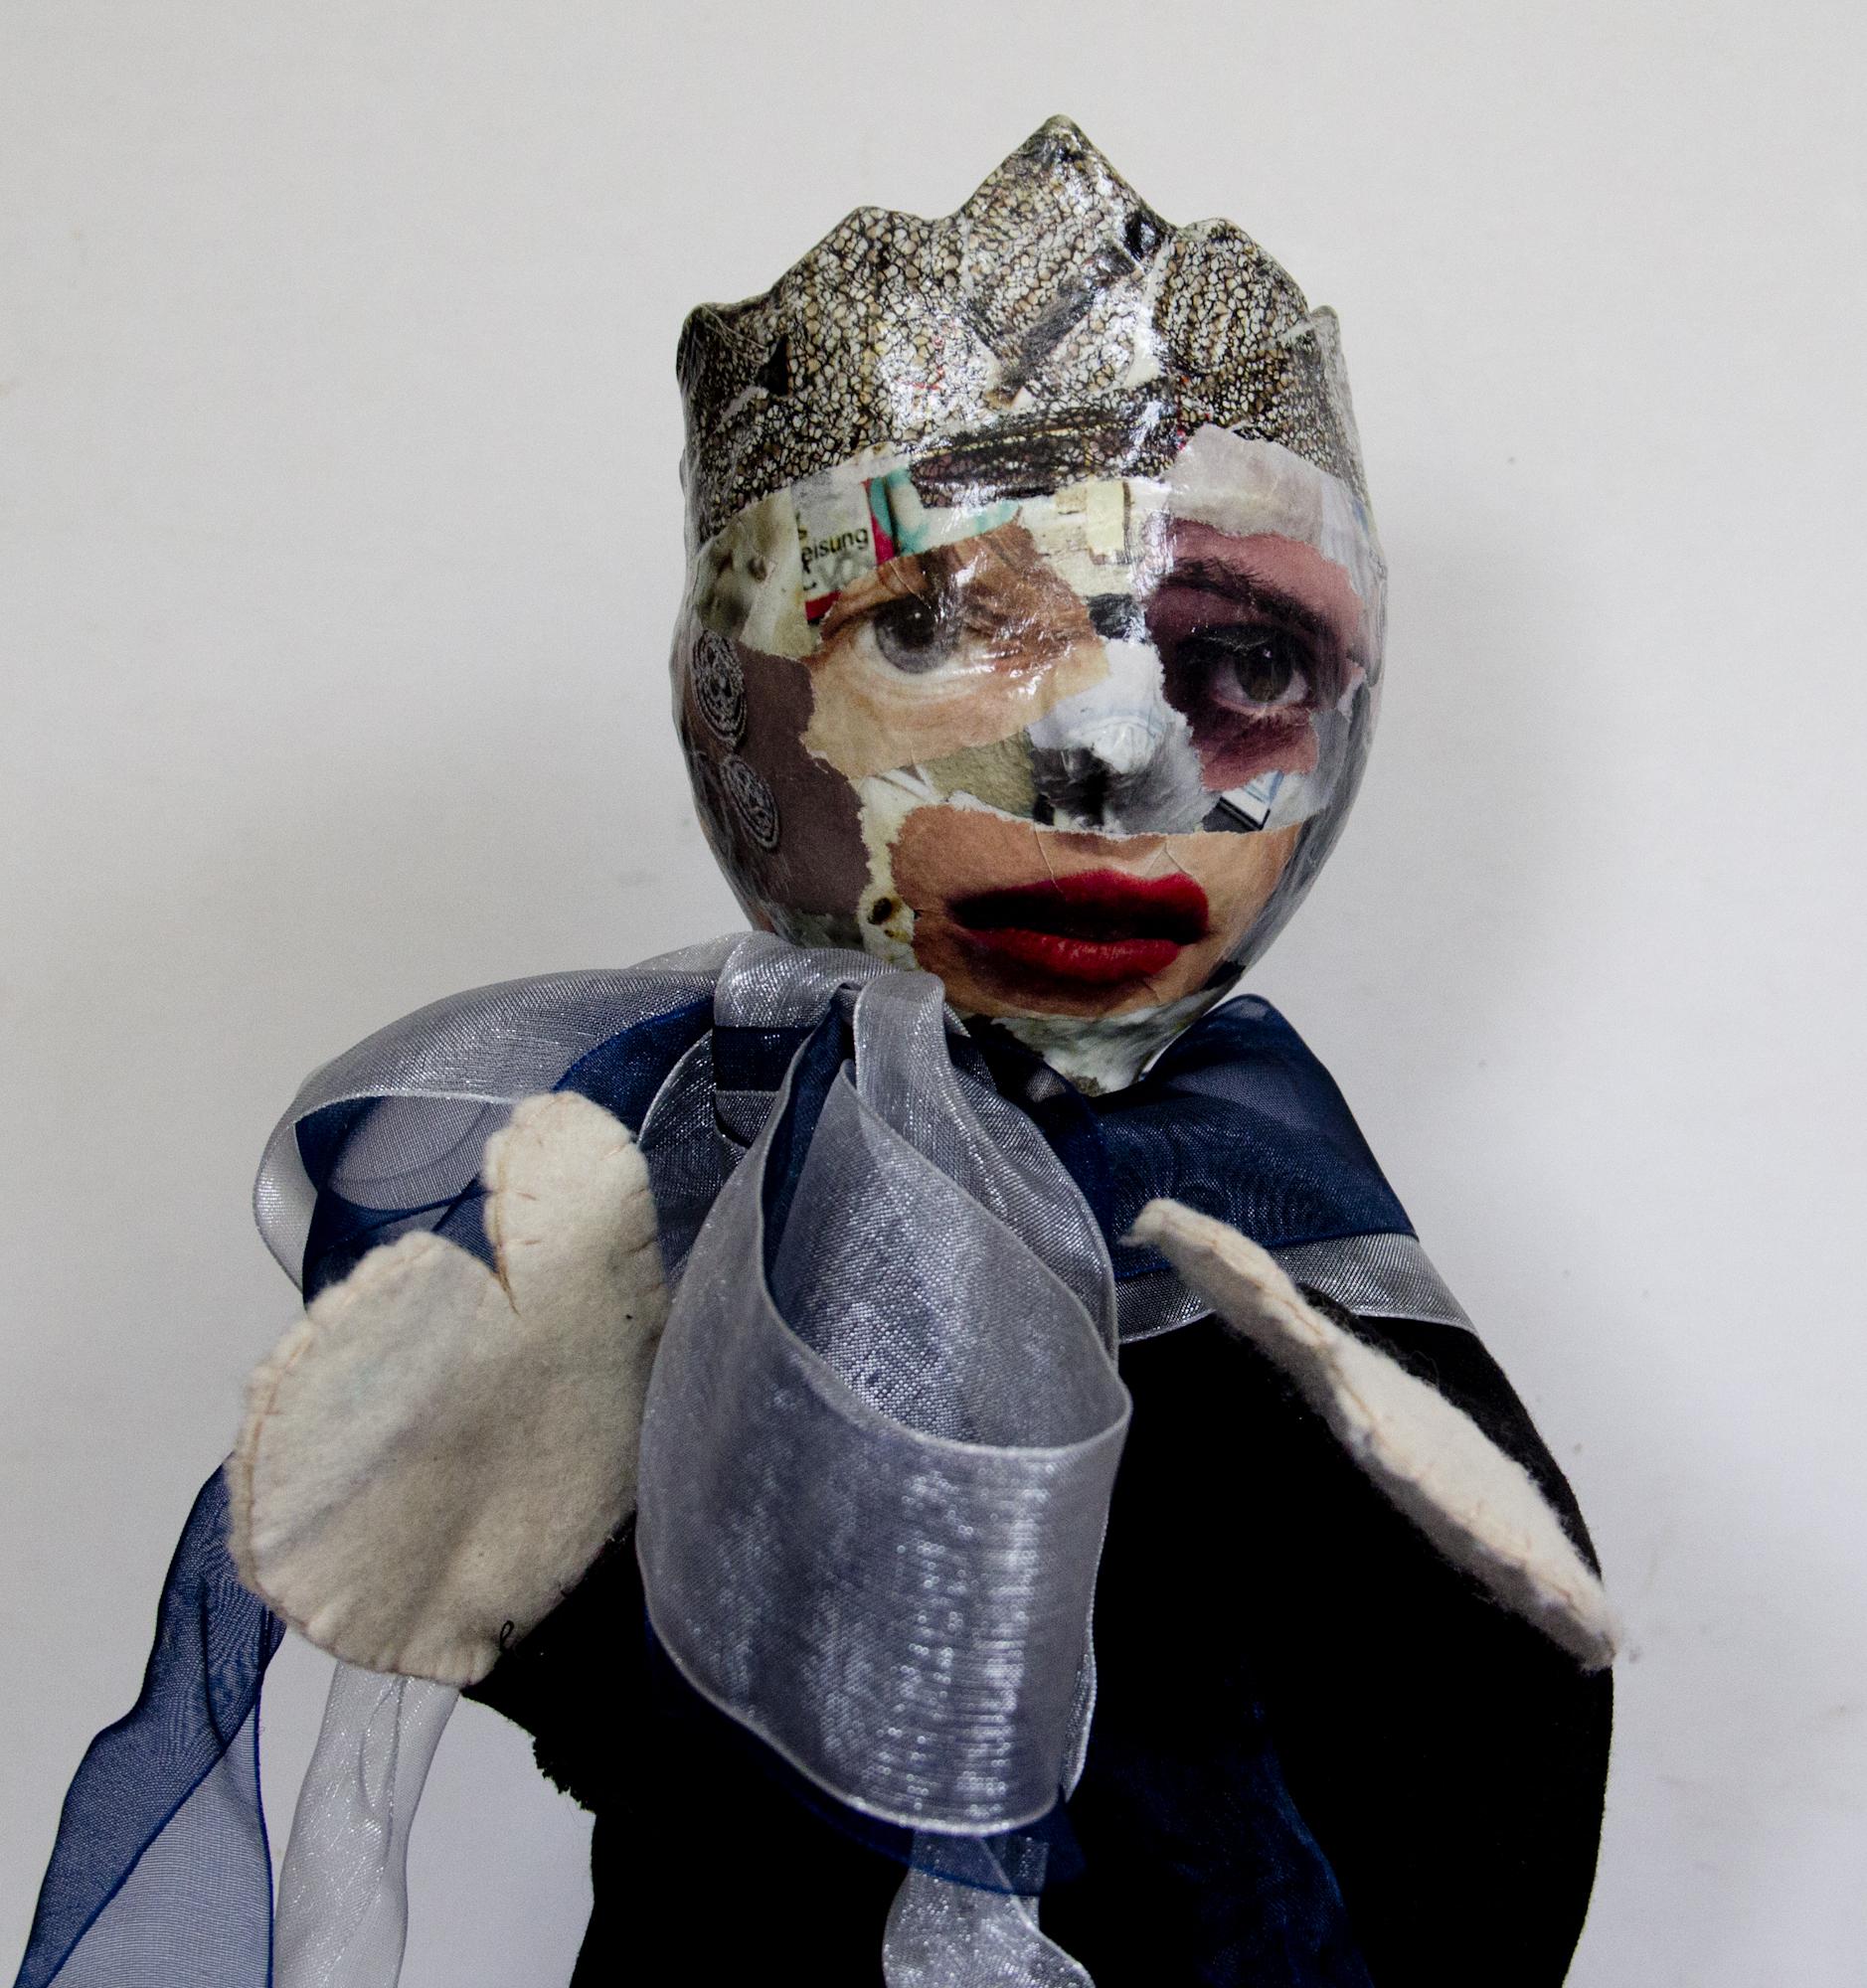 Chambermaid dressed up